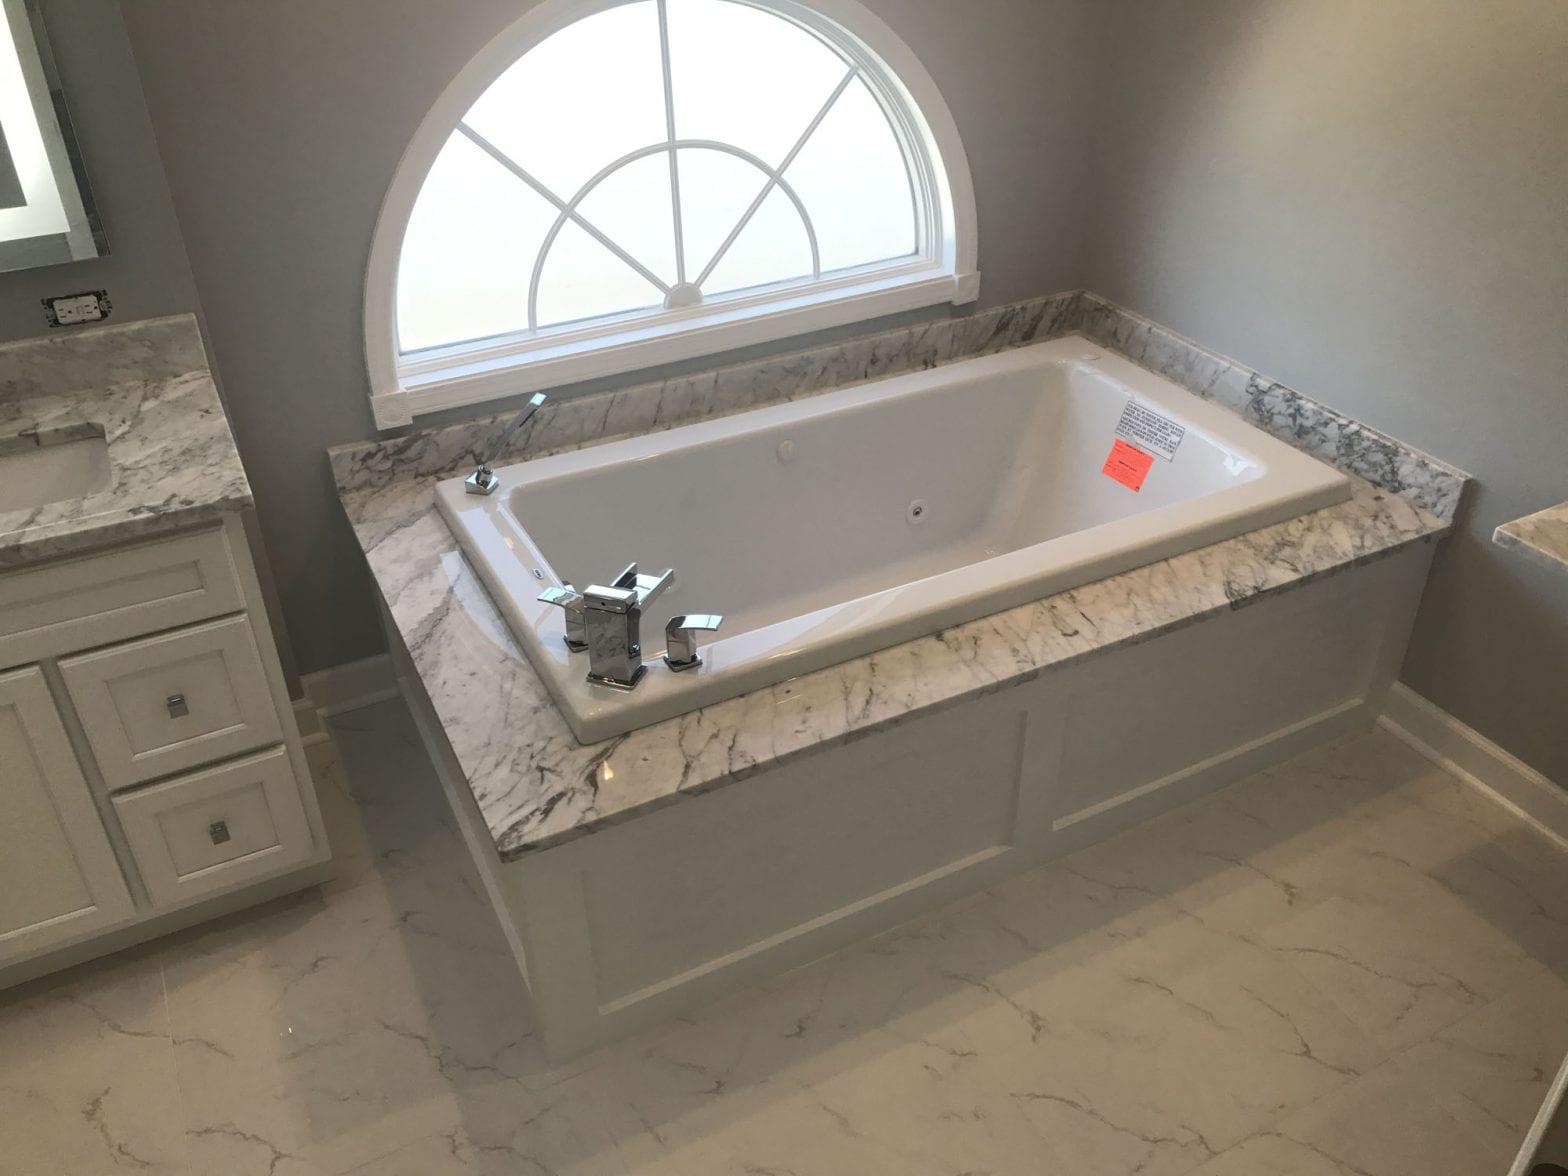 Bathroom Remodeling In Hoffman Estates - granite tub and countertops